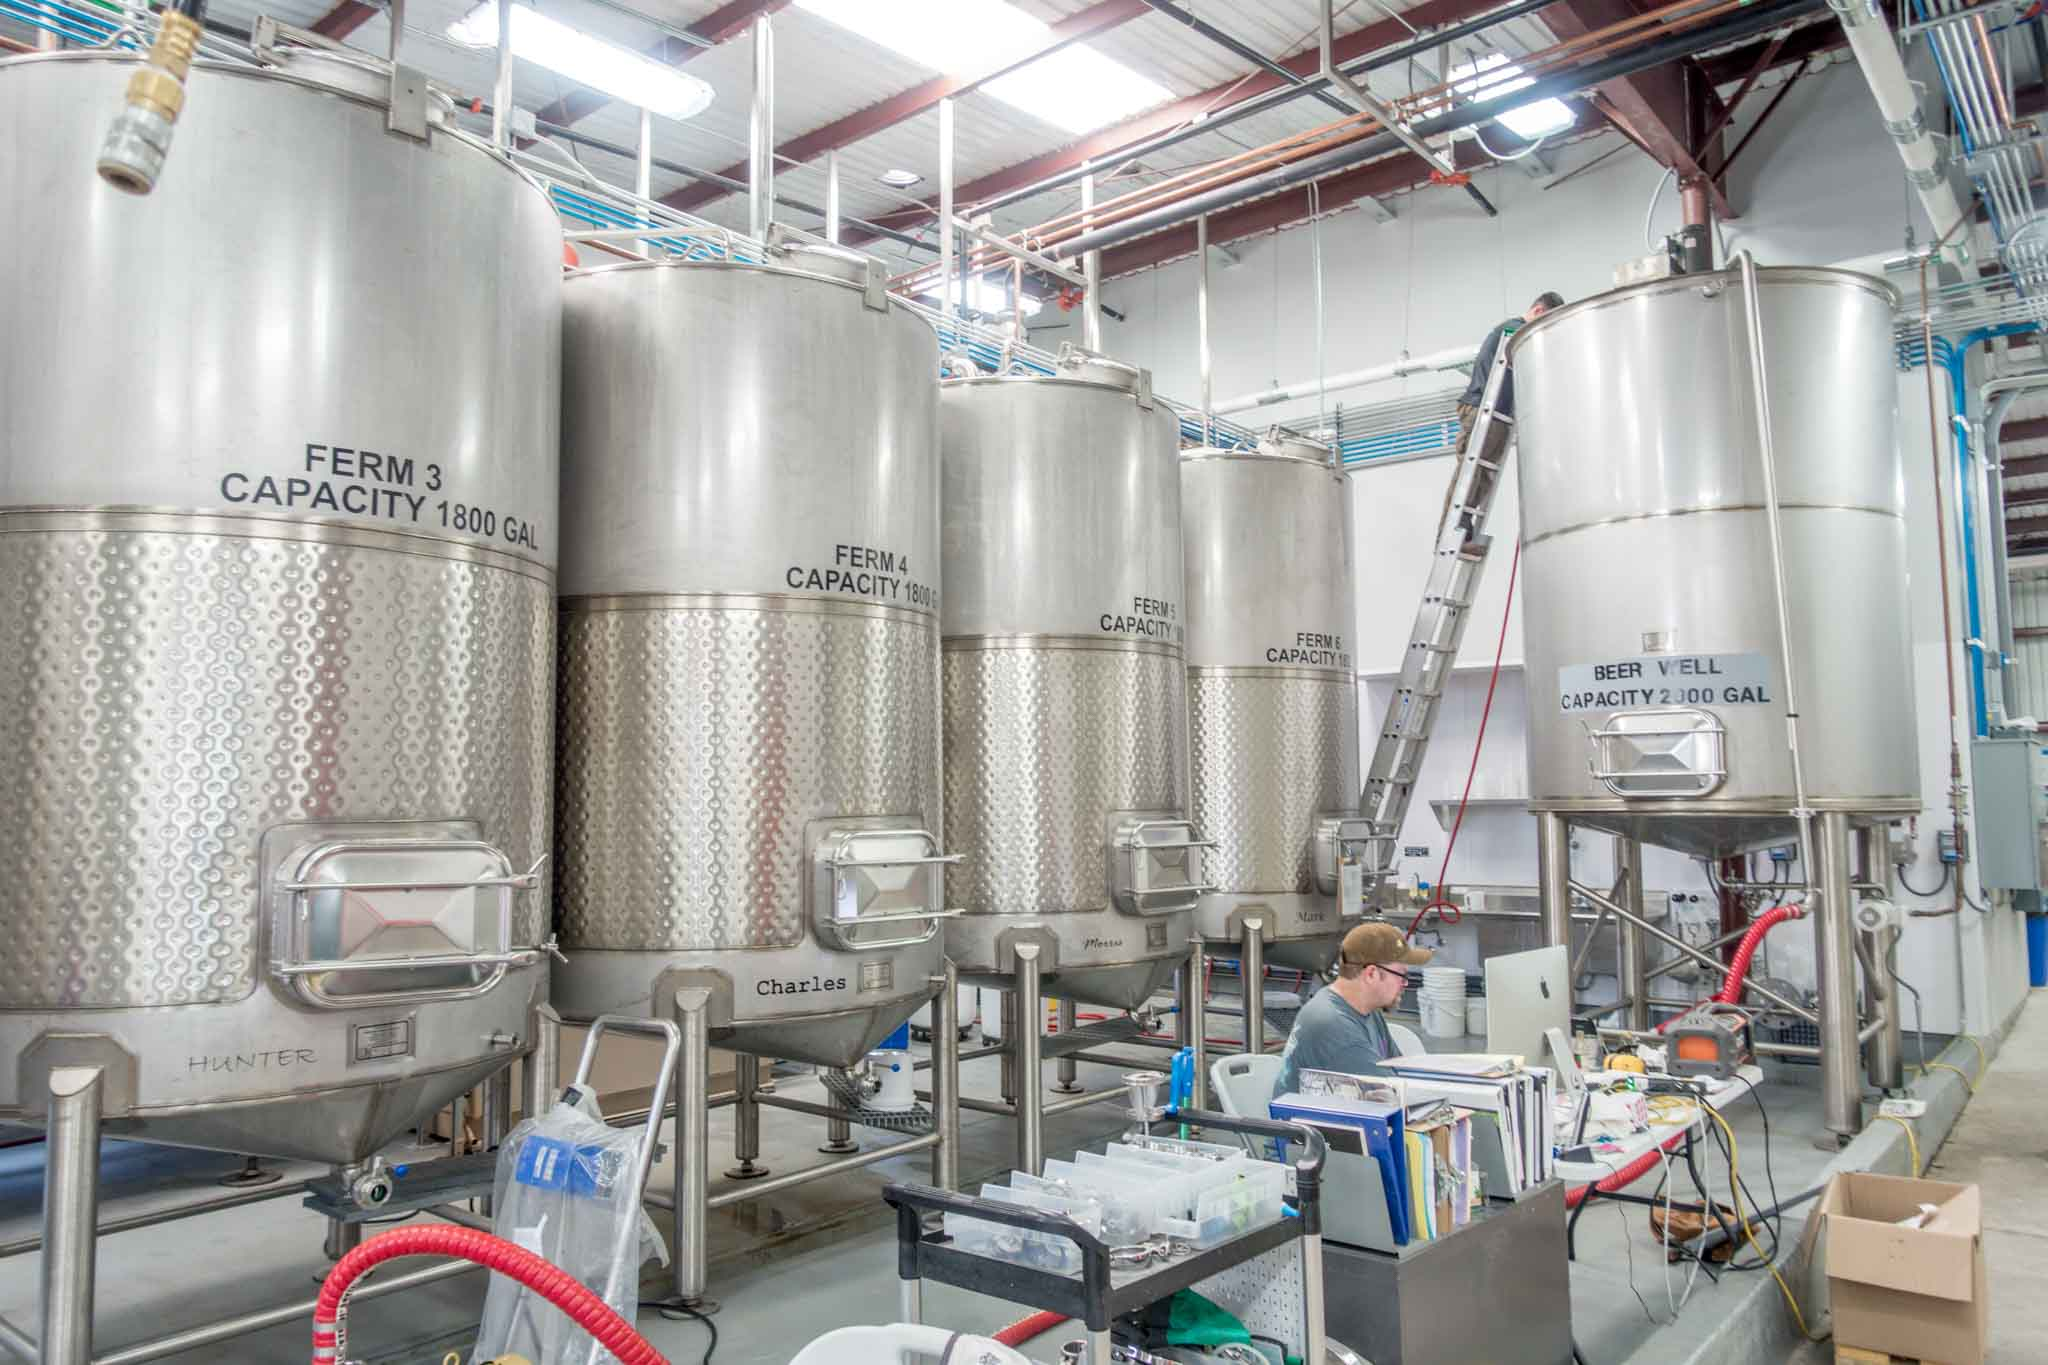 Steel fermentation tanks at a distillery